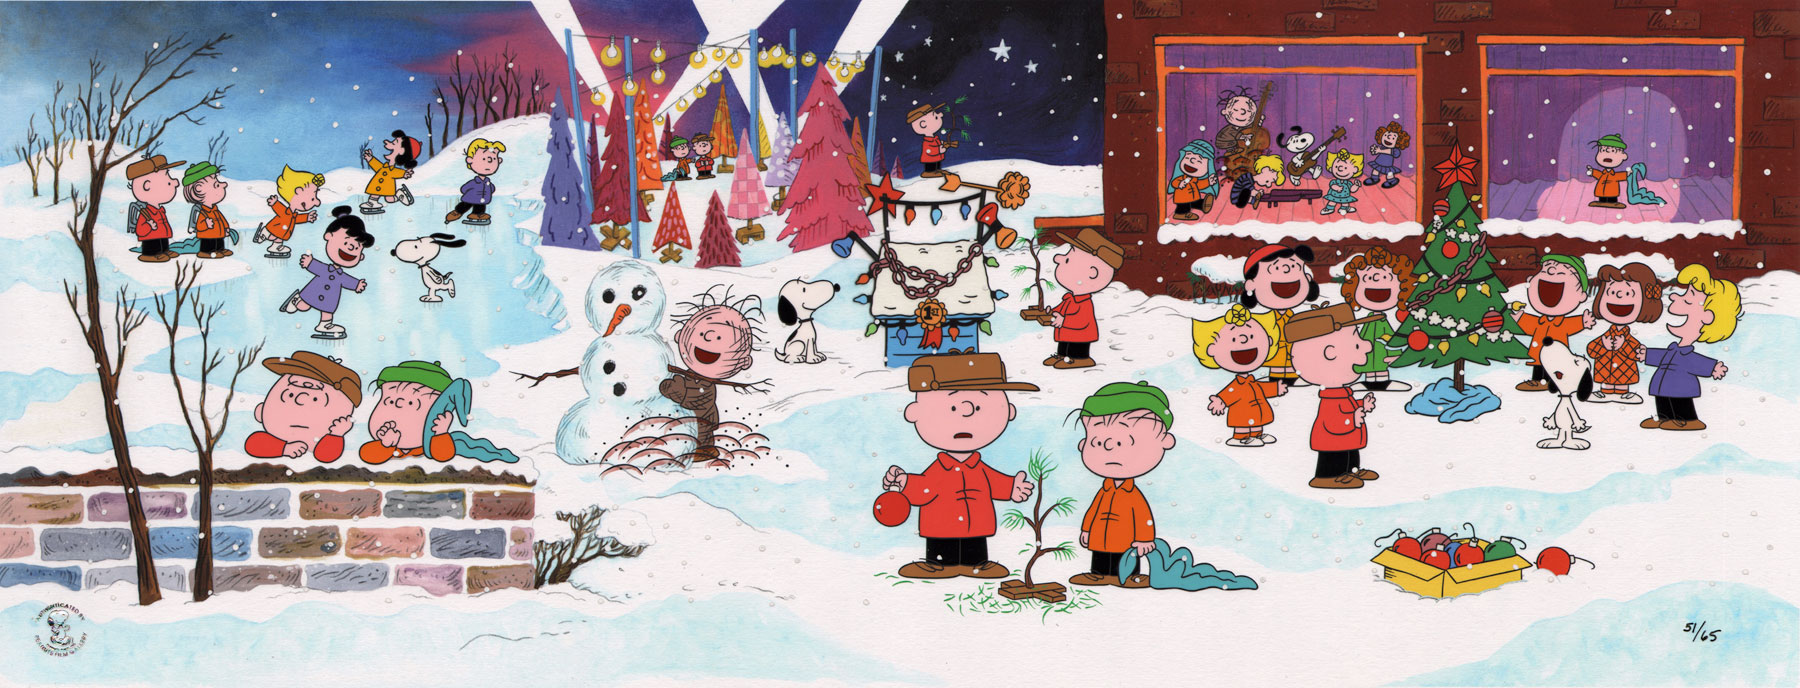 Charlie Browns Christmas.Comic Mint Animation Art Charlie Brown S Christmas Celebrating 50 Years Of Joy And Wonder